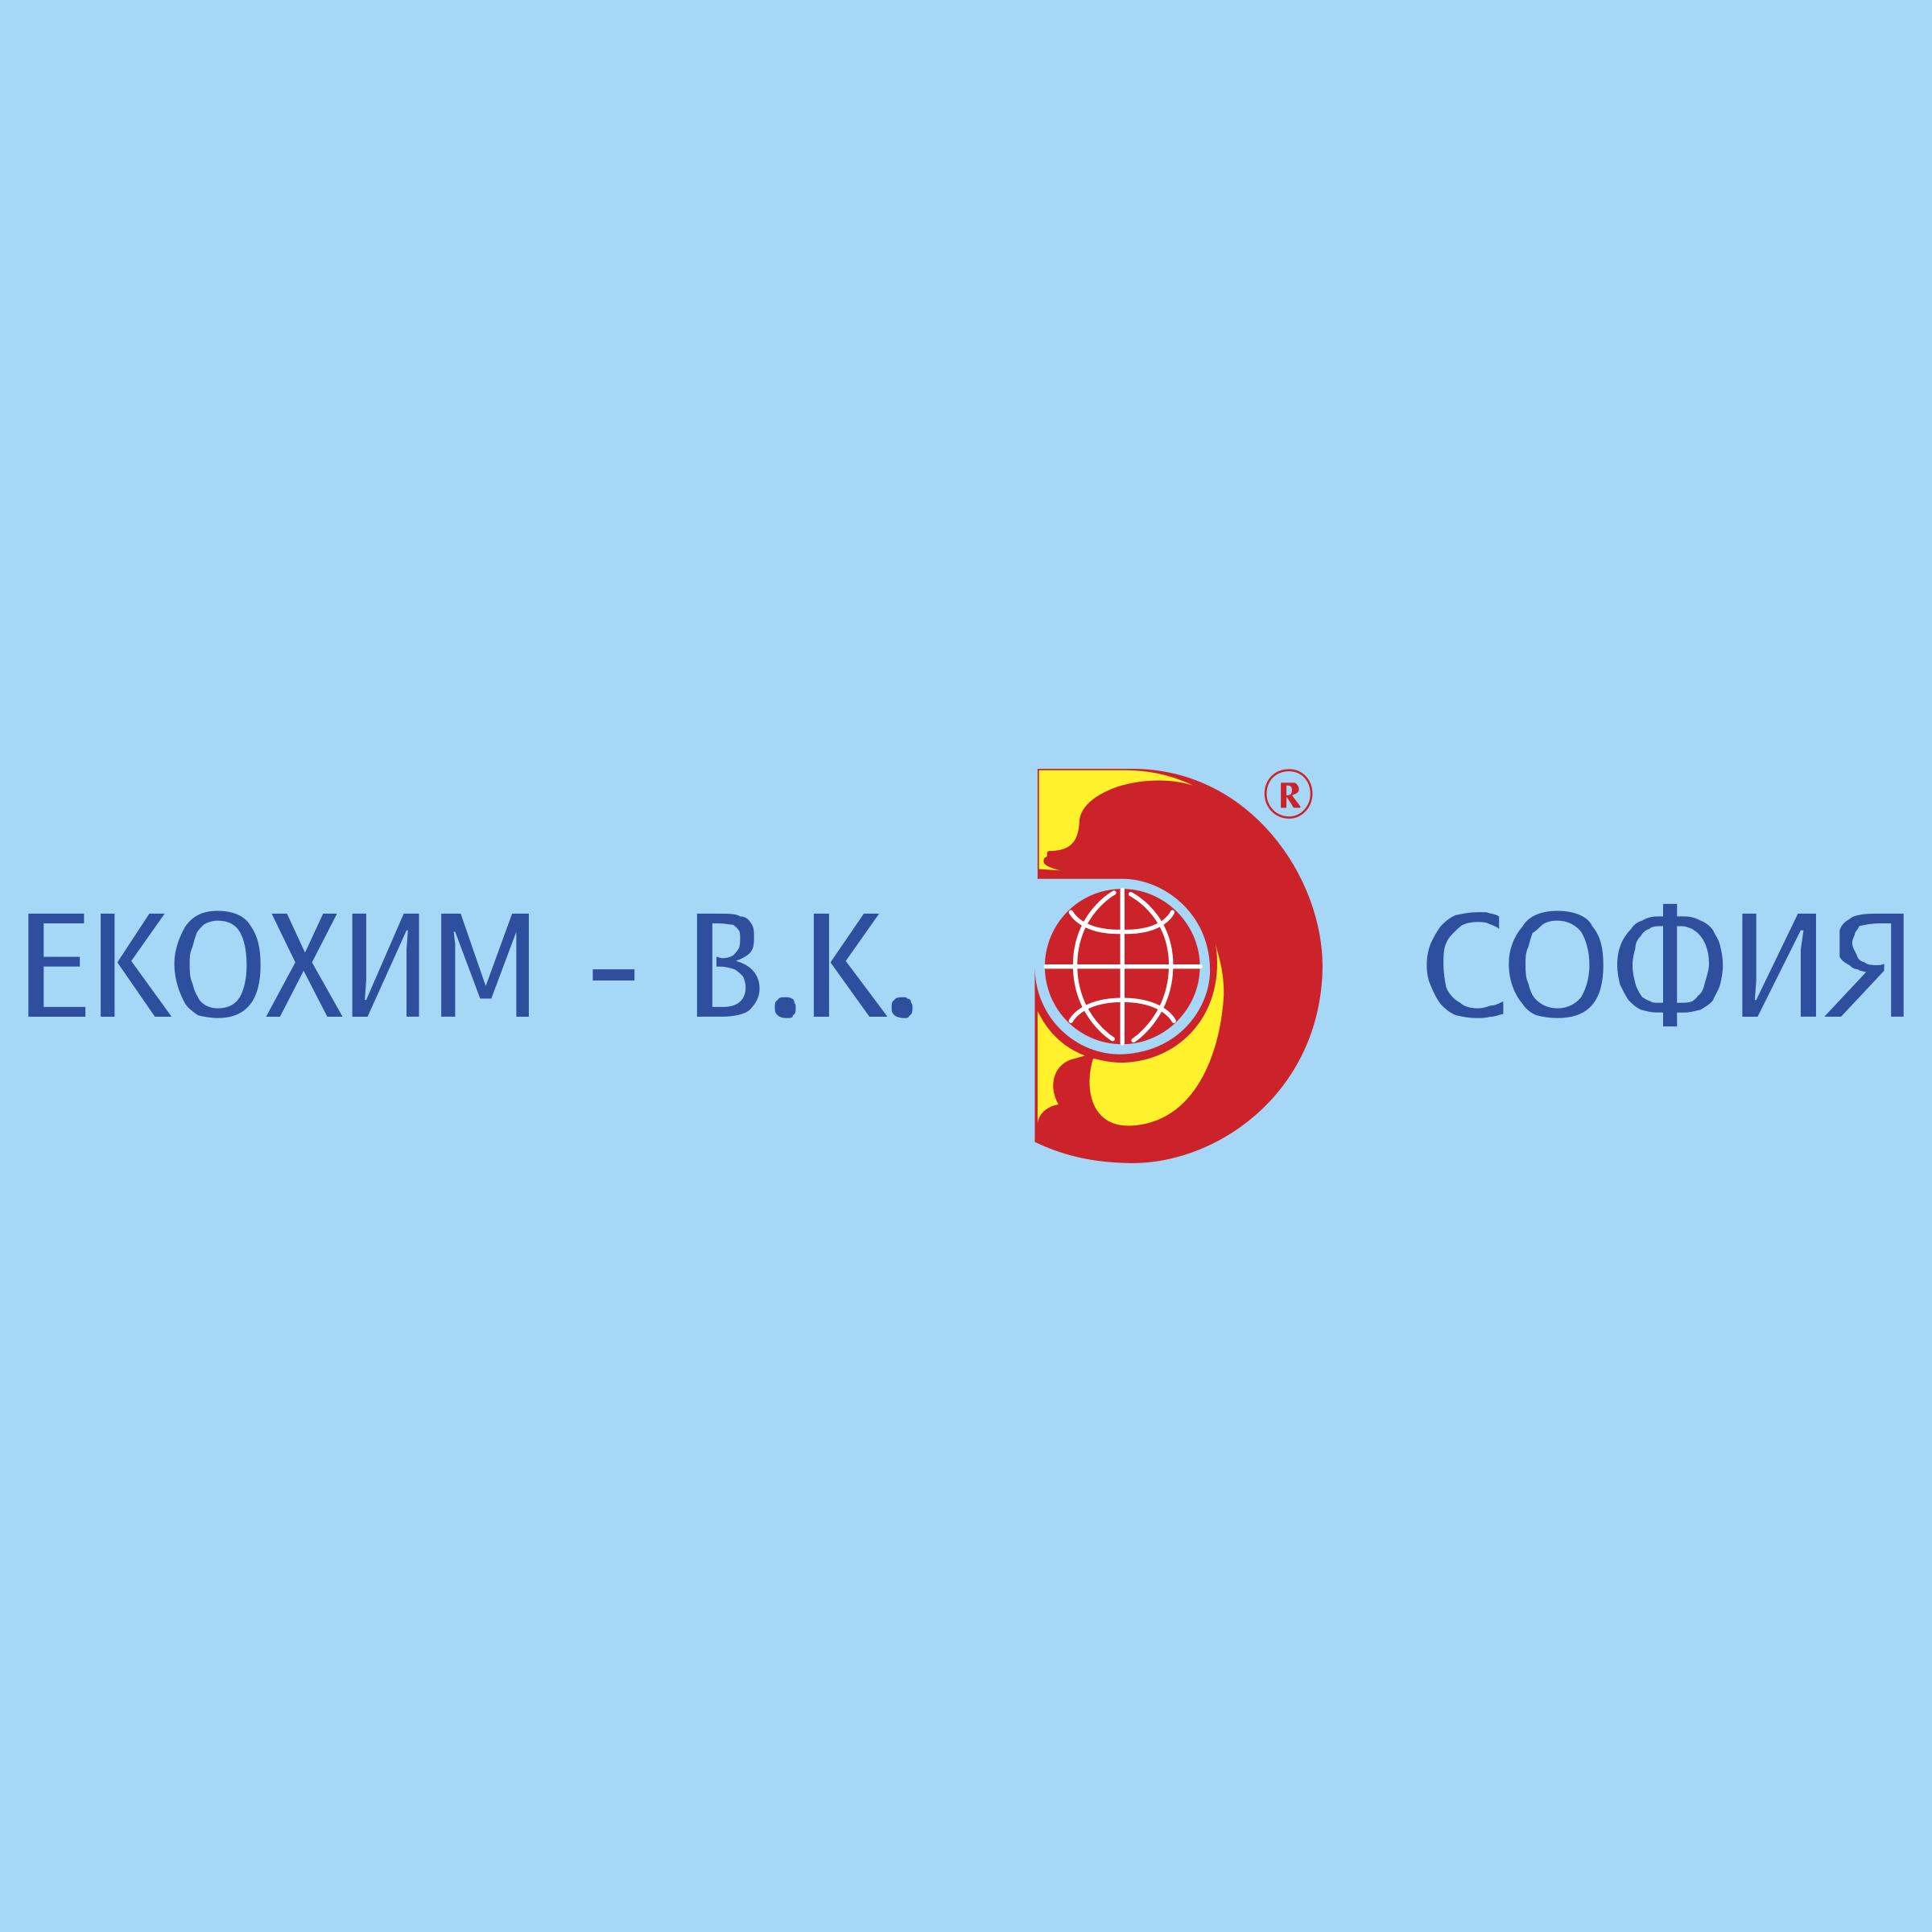 Ecohim vk logo png transparent svg vector freebie supply ecohim vk logo png transparent toneelgroepblik Image collections